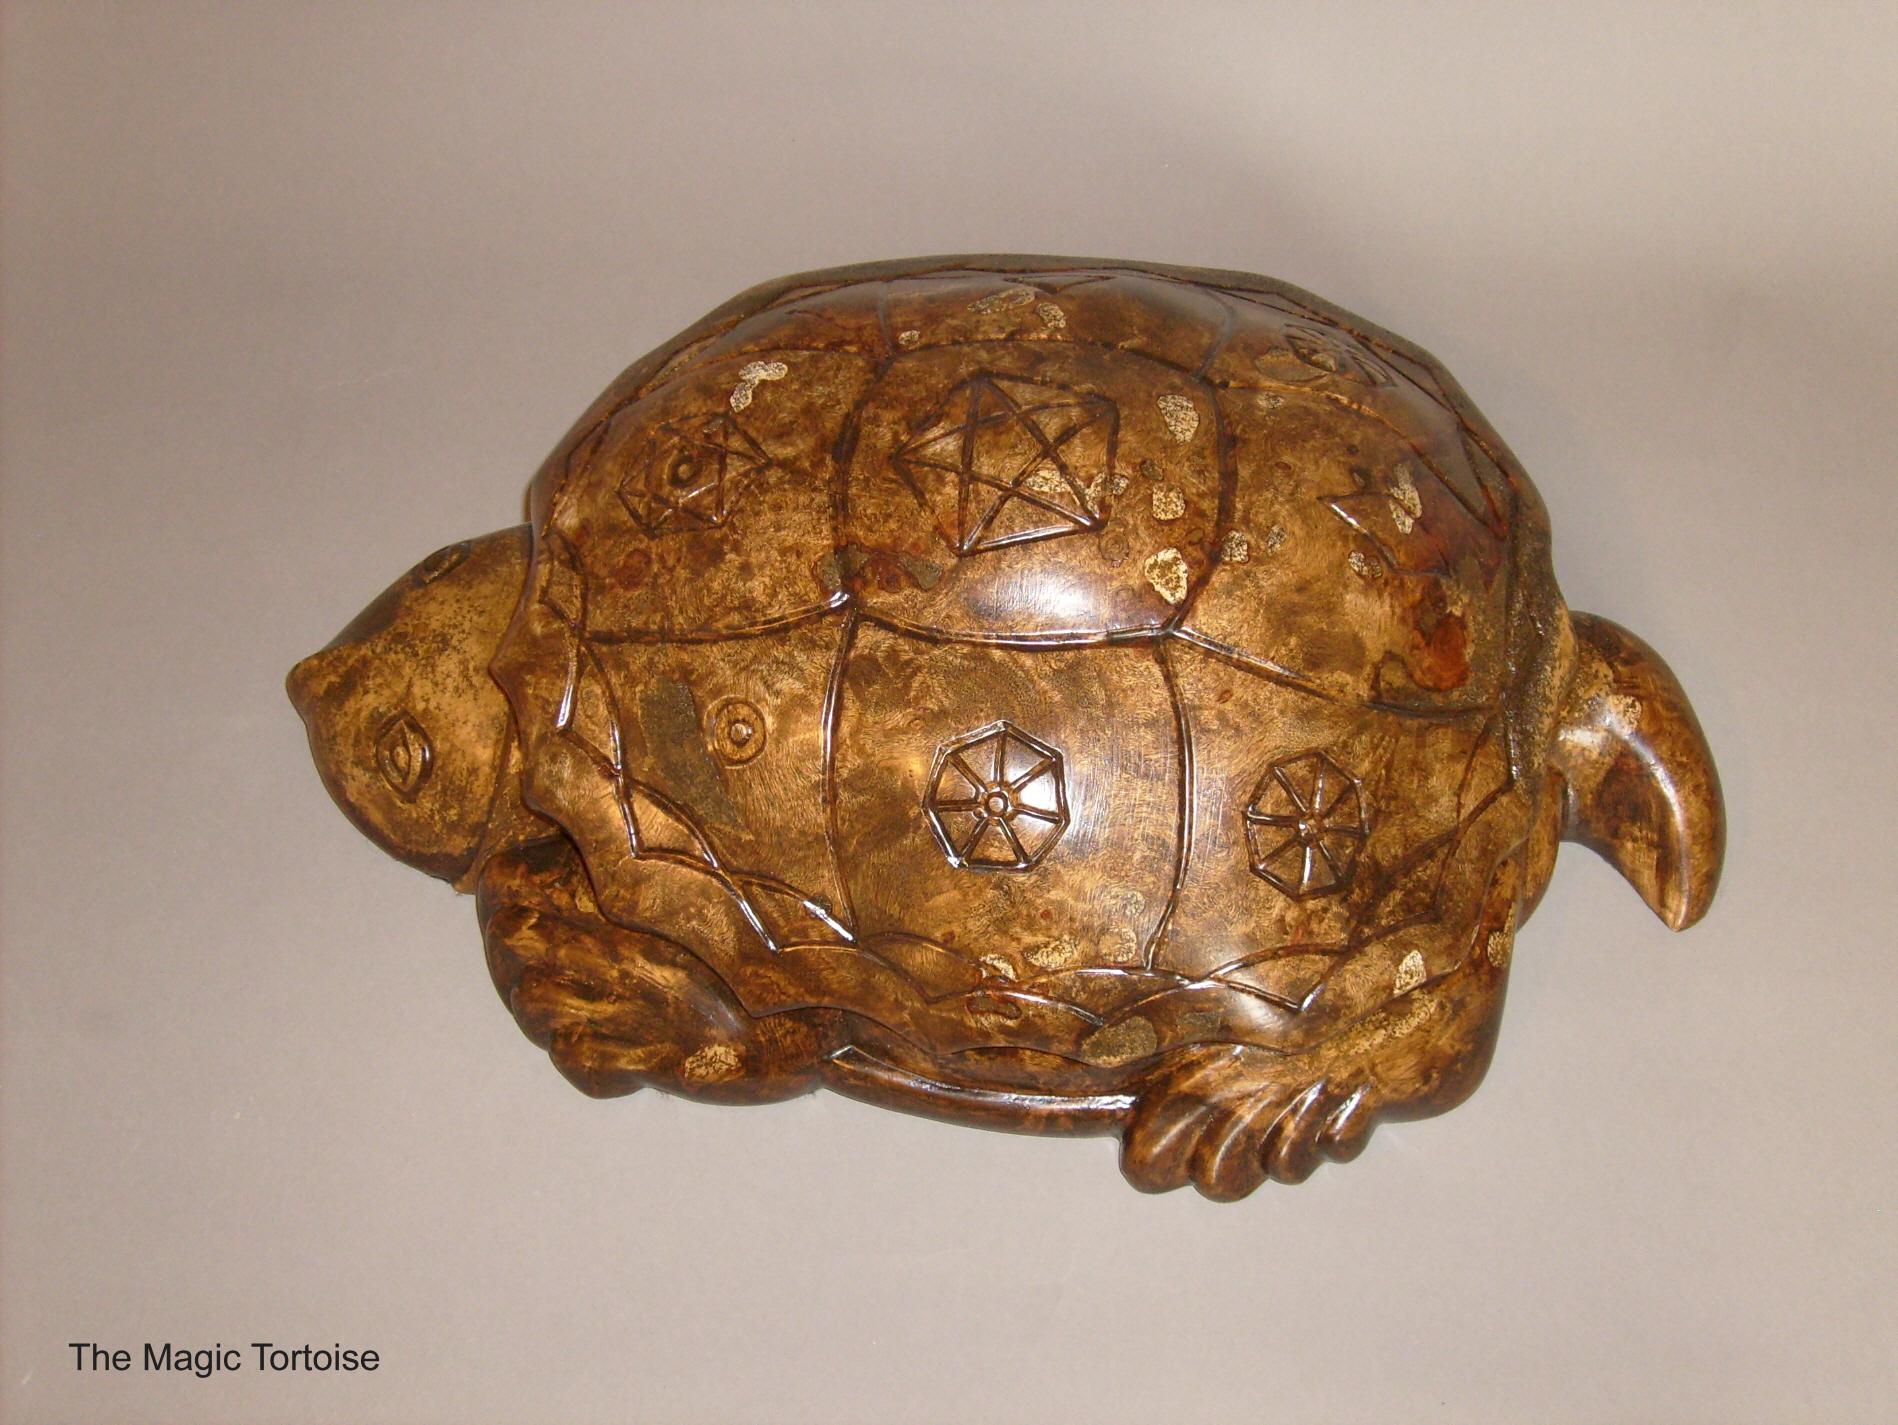 The Magic Tortoise